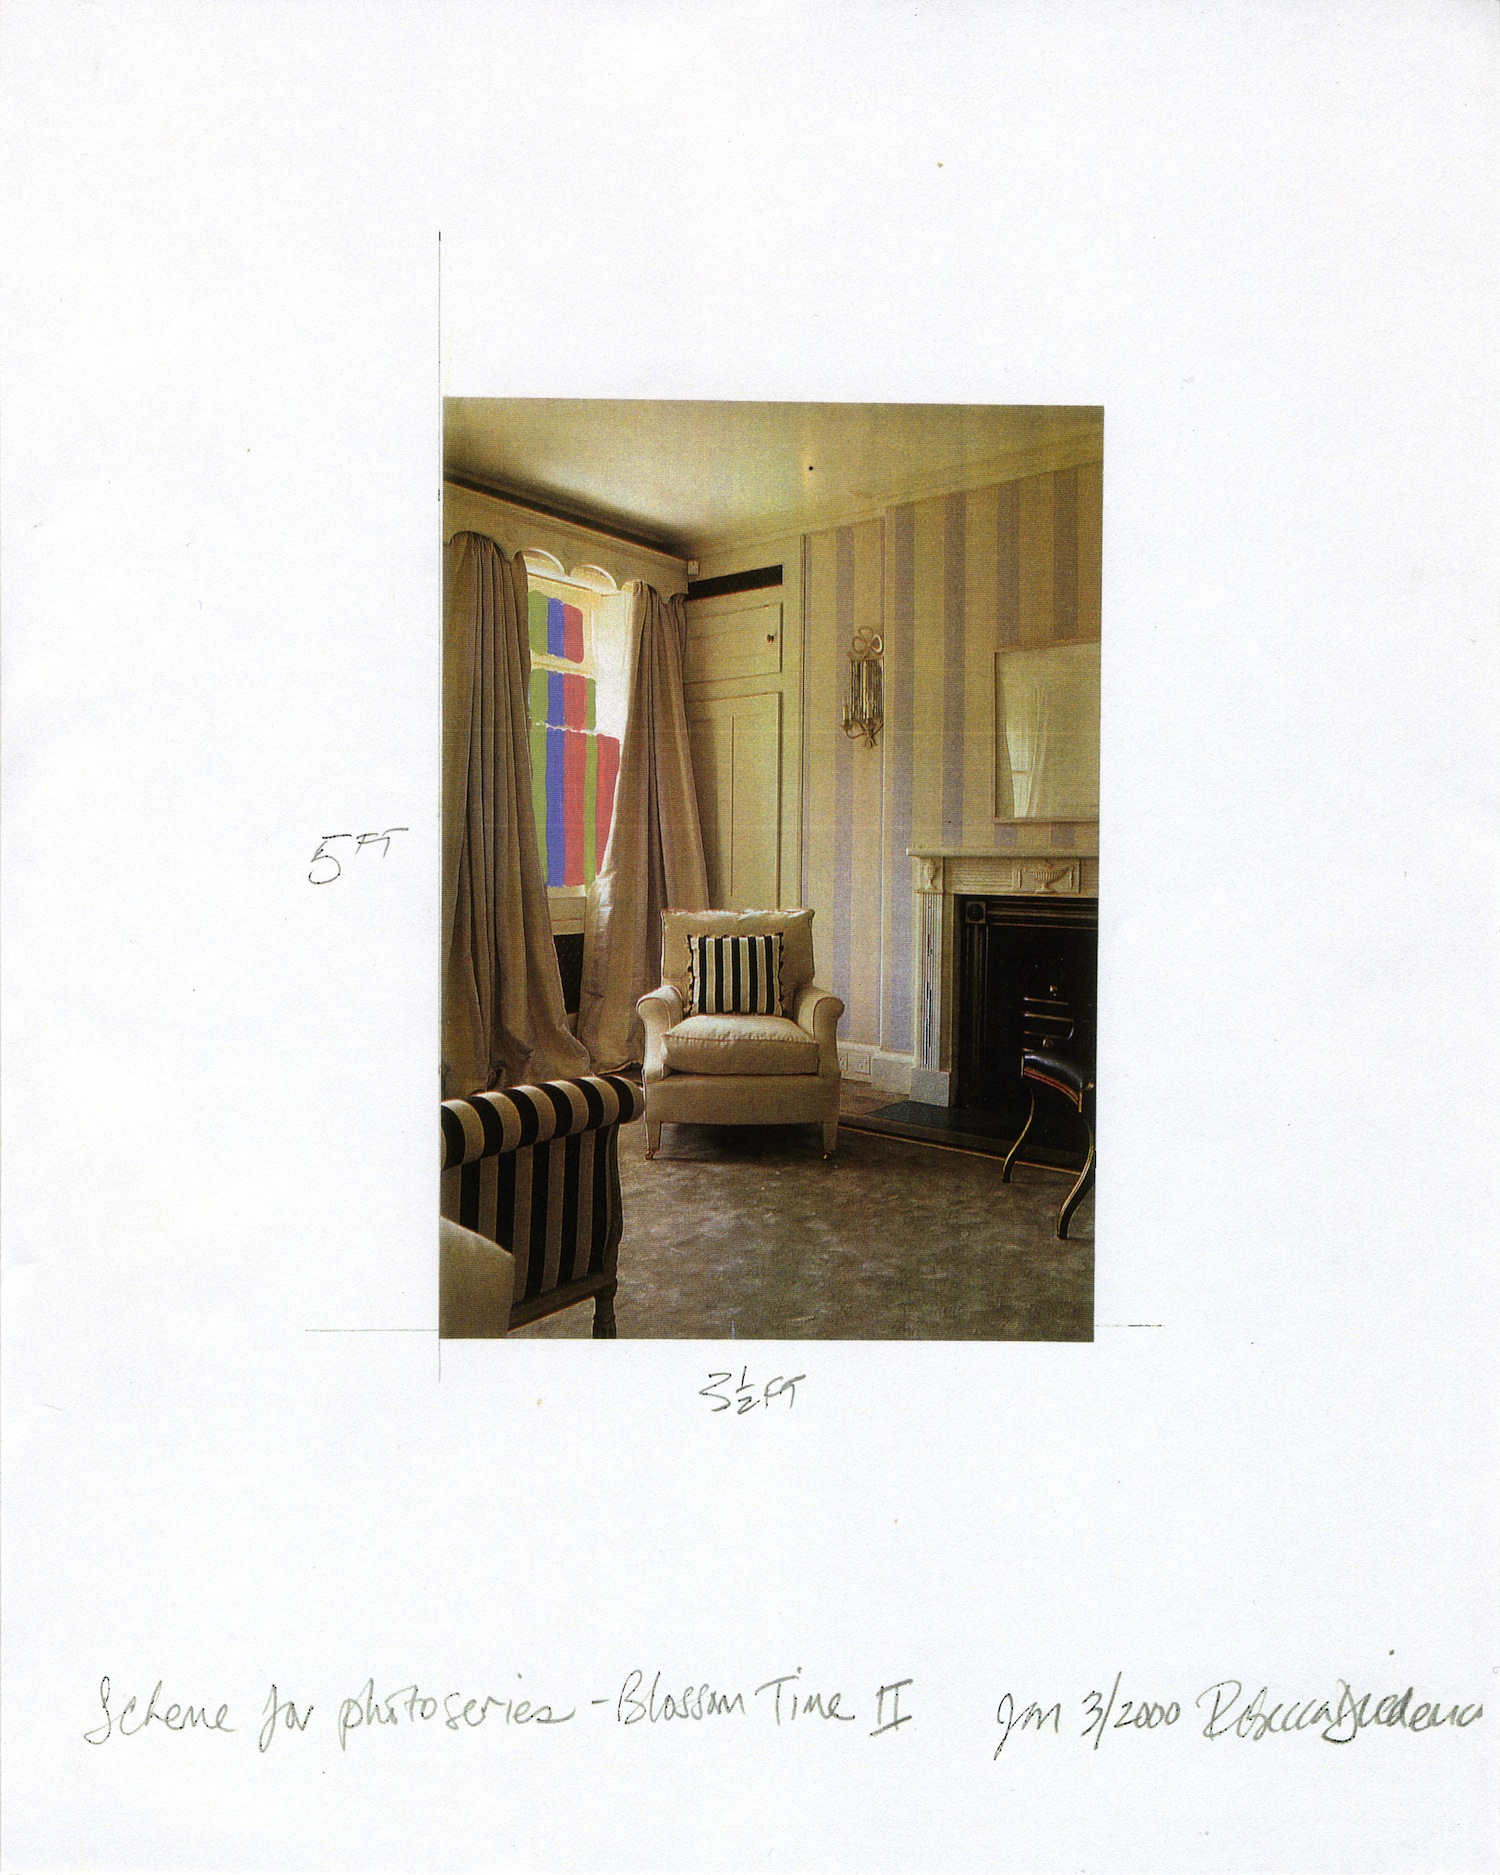 REBECCA DIEDERICHS  Scheme for photo series, Blossom Time II , 2000 Xerox